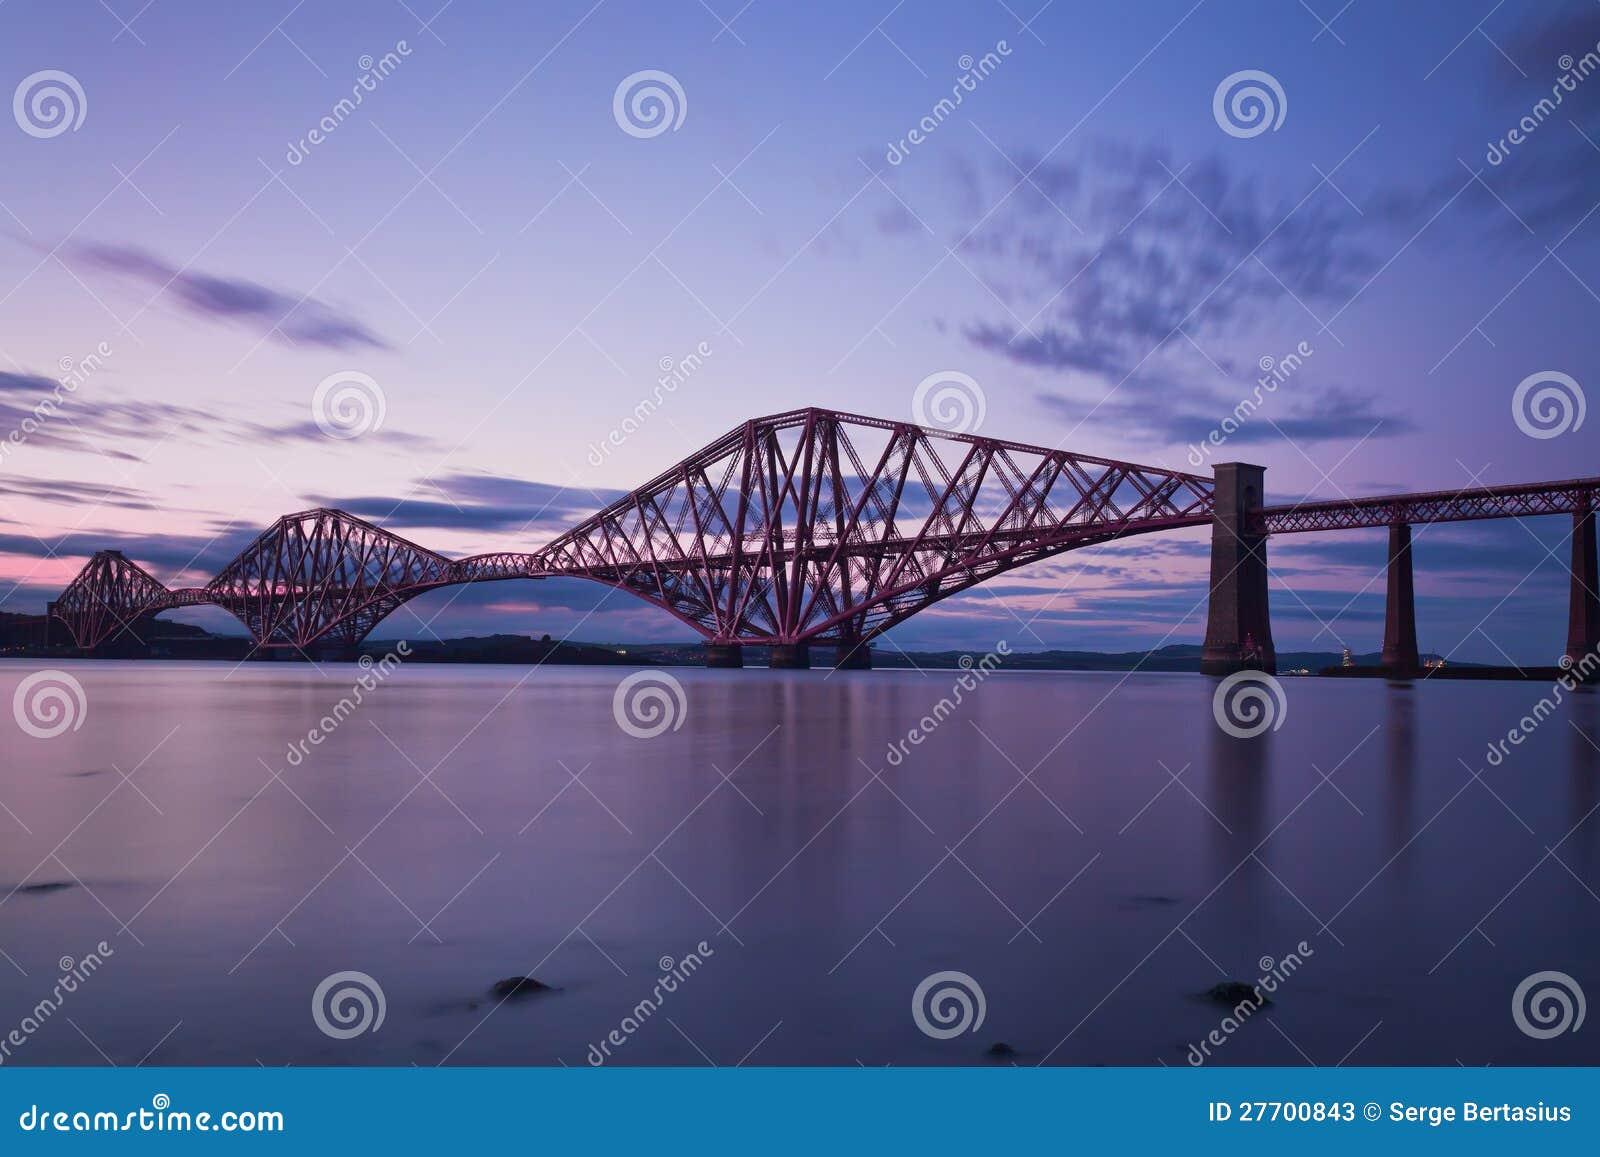 The Forth Rail Bridge Edinburgh, Scotl